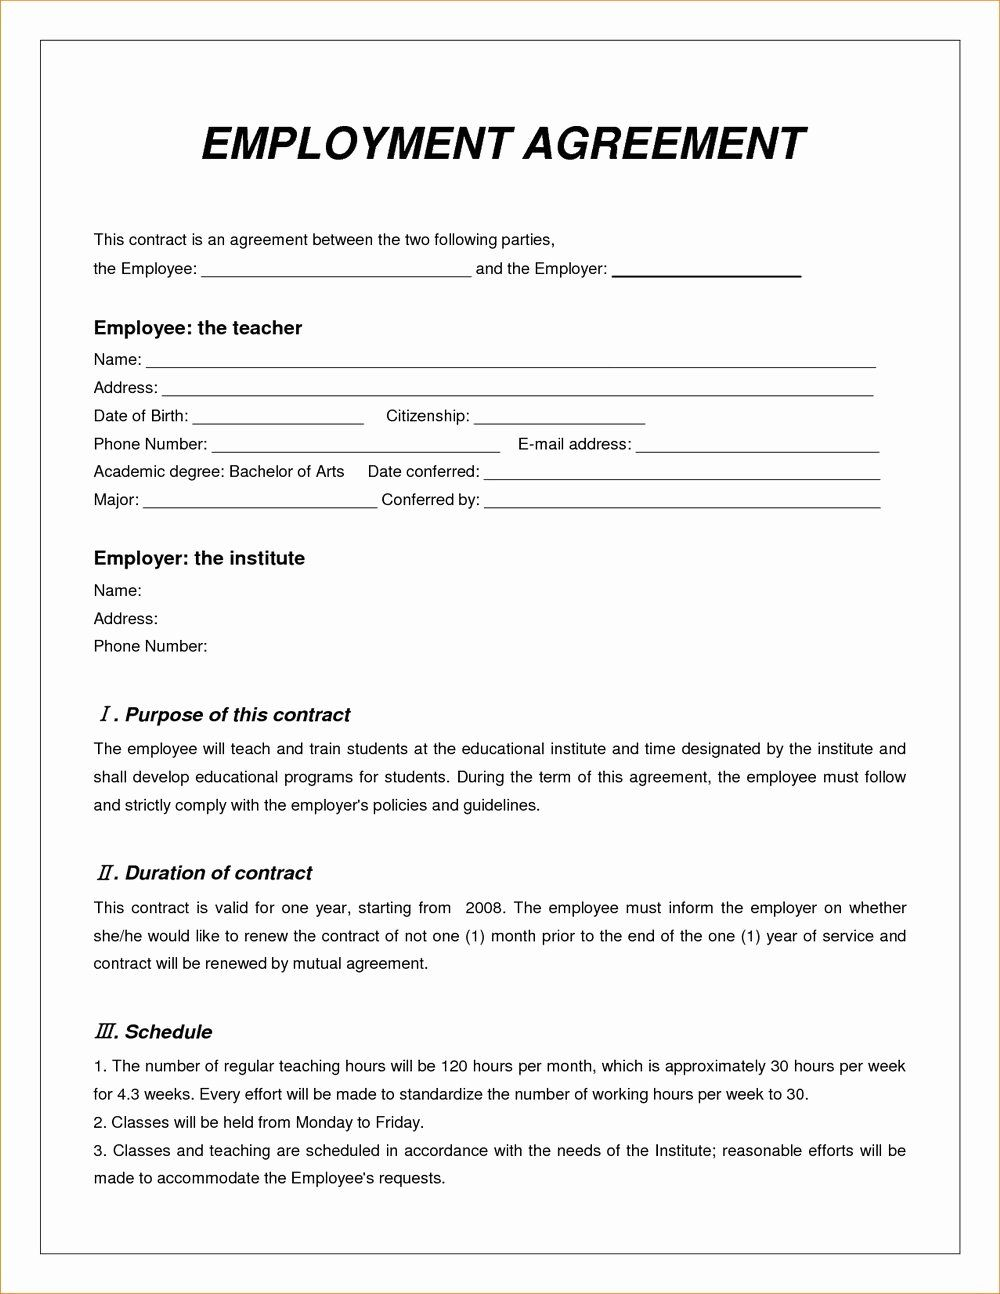 Google Docs Envelope Template Fresh Envelope Printing Template Google Docs Templates Contract Agreement Contract Template Work Agreement Free employment contract template word